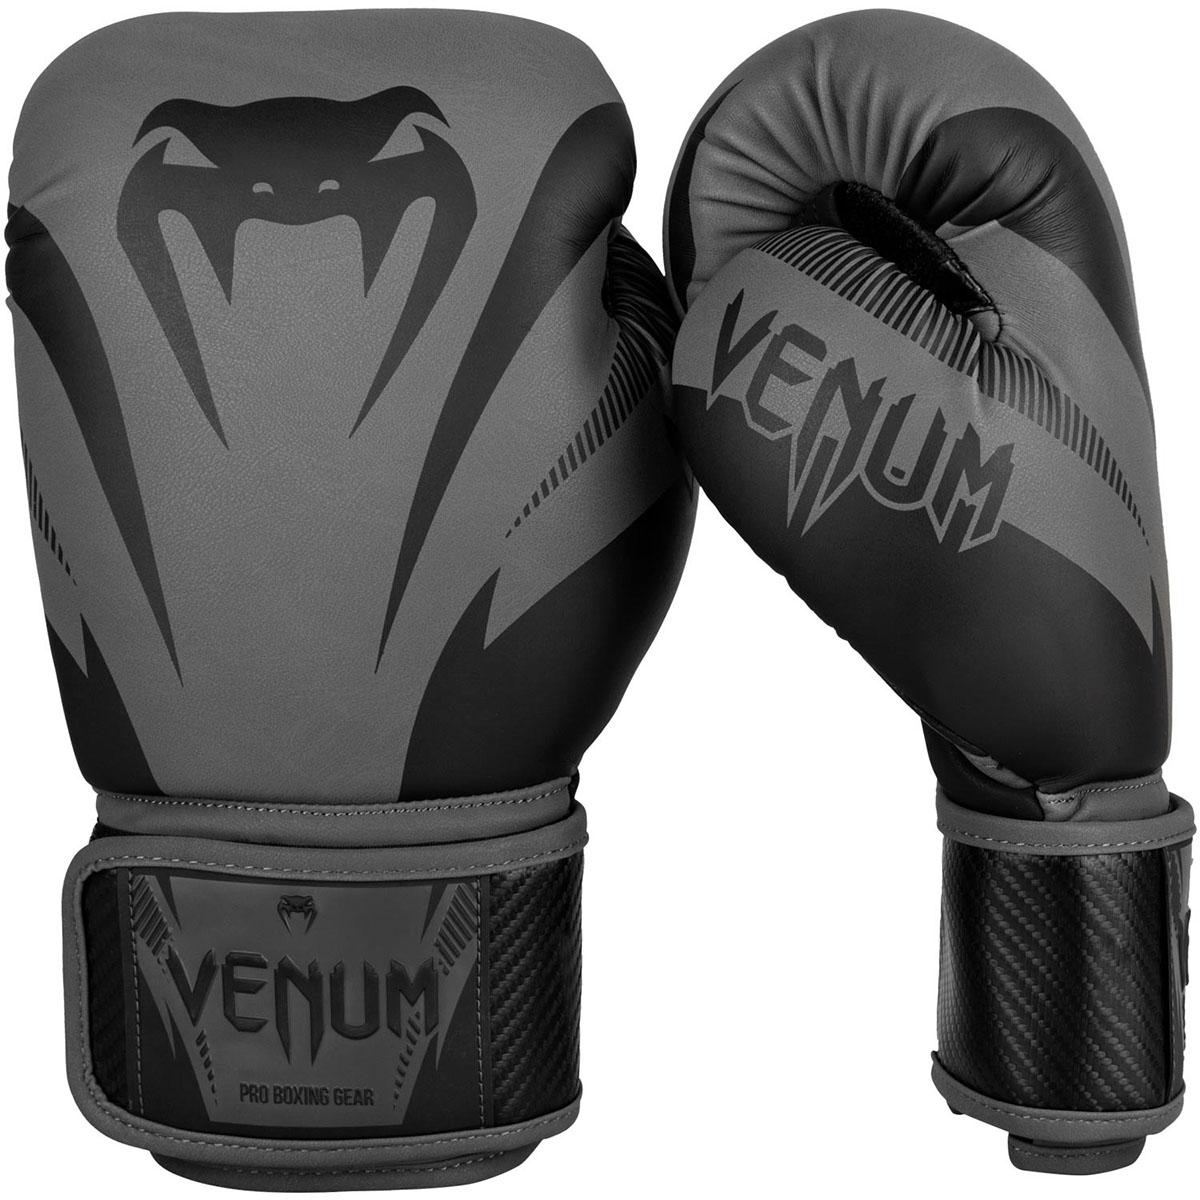 ac0070712f Venum Impact Hook and Loop Training Boxing Gloves - 8 oz. - Gray Black